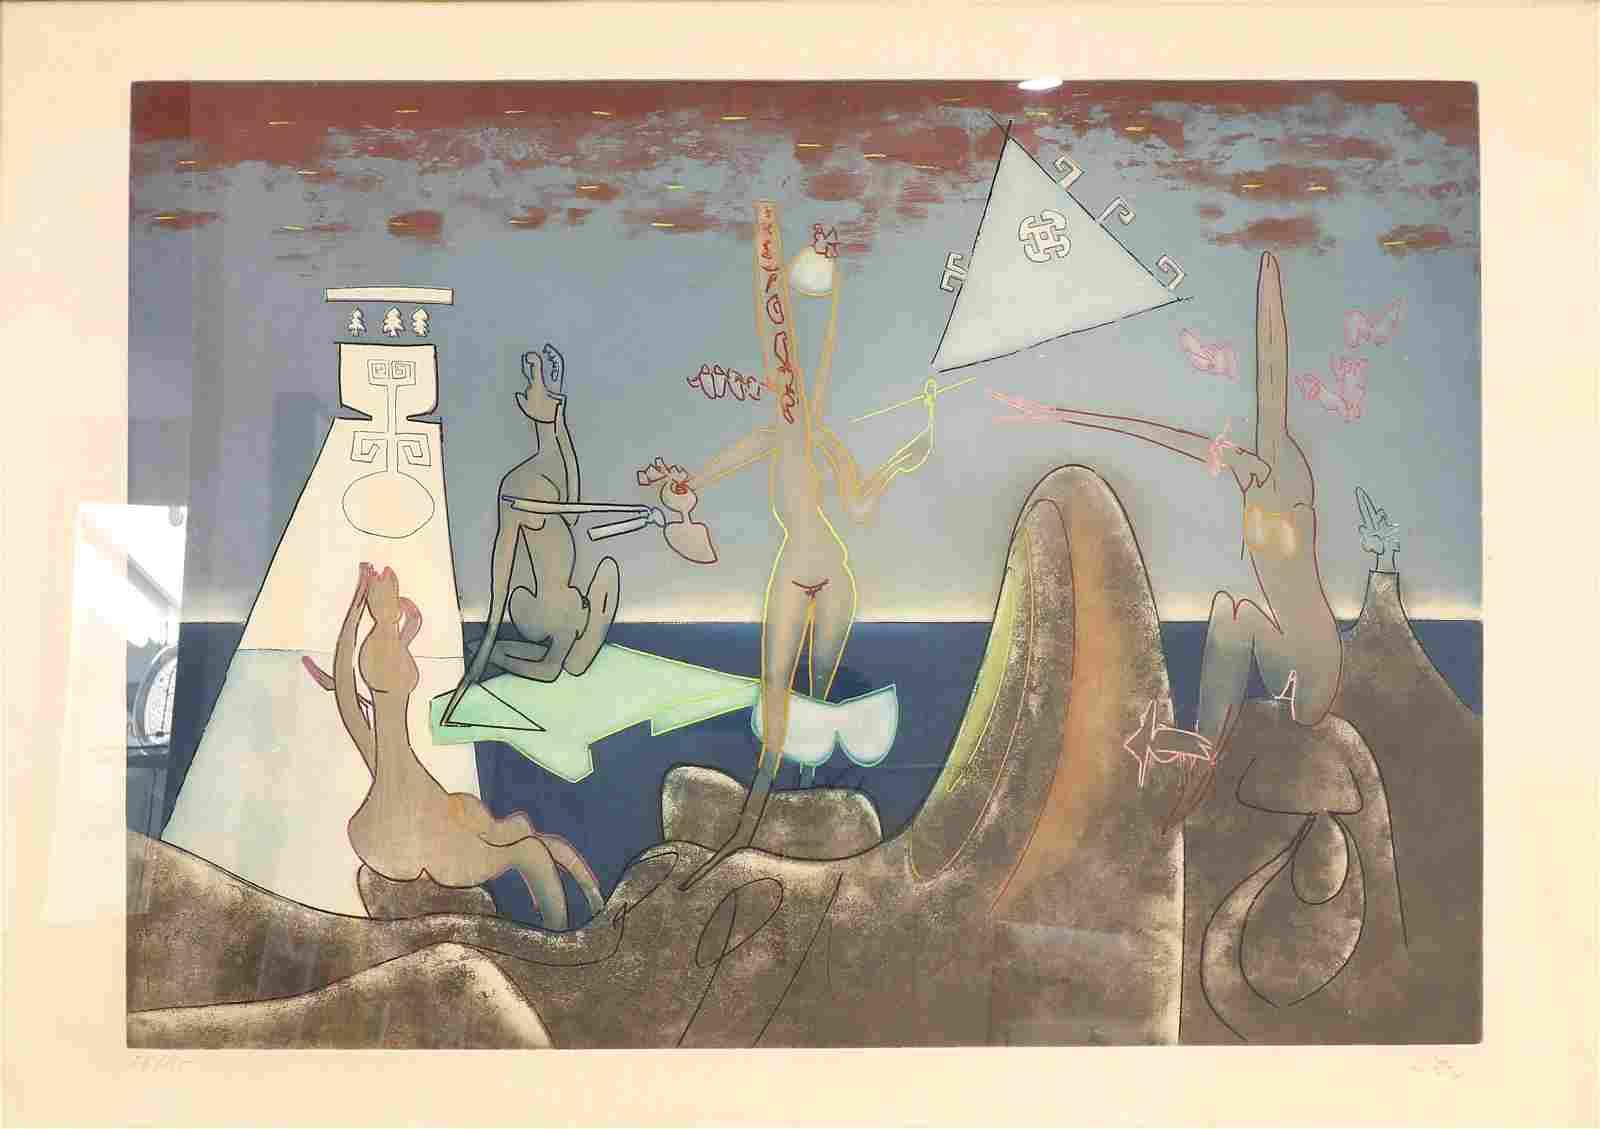 Roberto Matta (CHILEAN, 1911-2002) Aquatint Etching